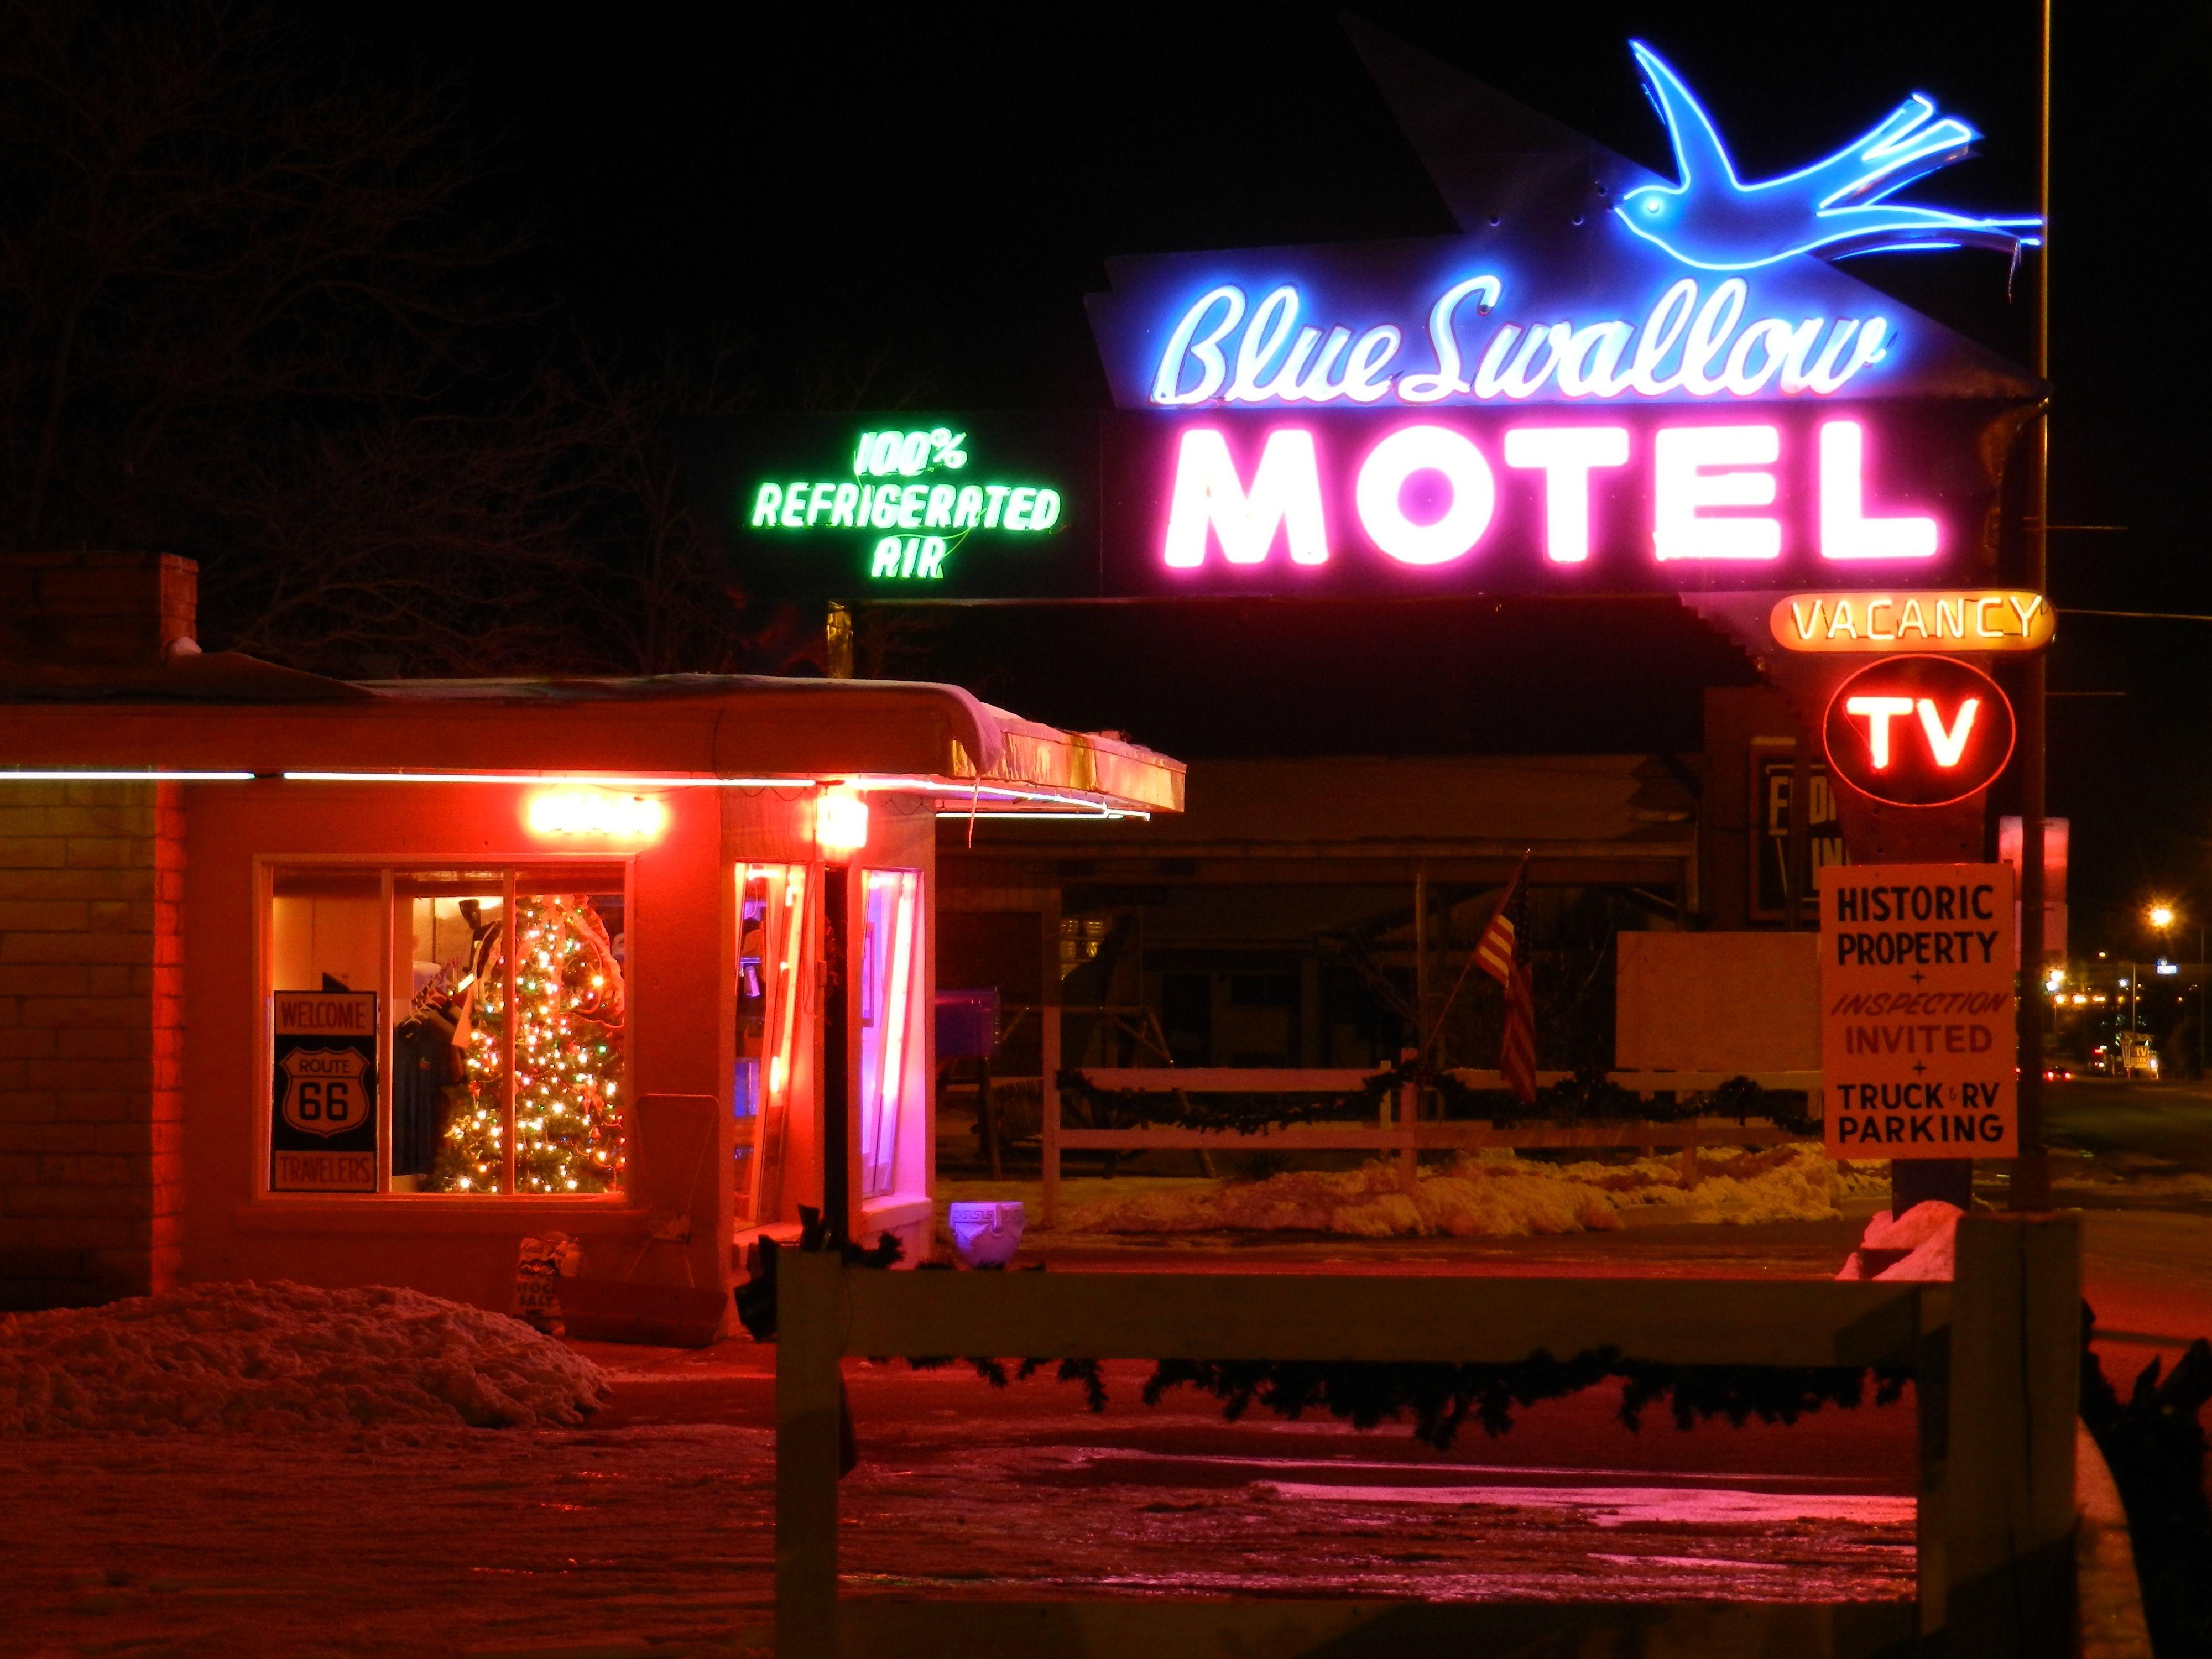 Blue Swallow Motel In Tucumcari Nm Blue Swallow Motel Blue Swallow Travel Route